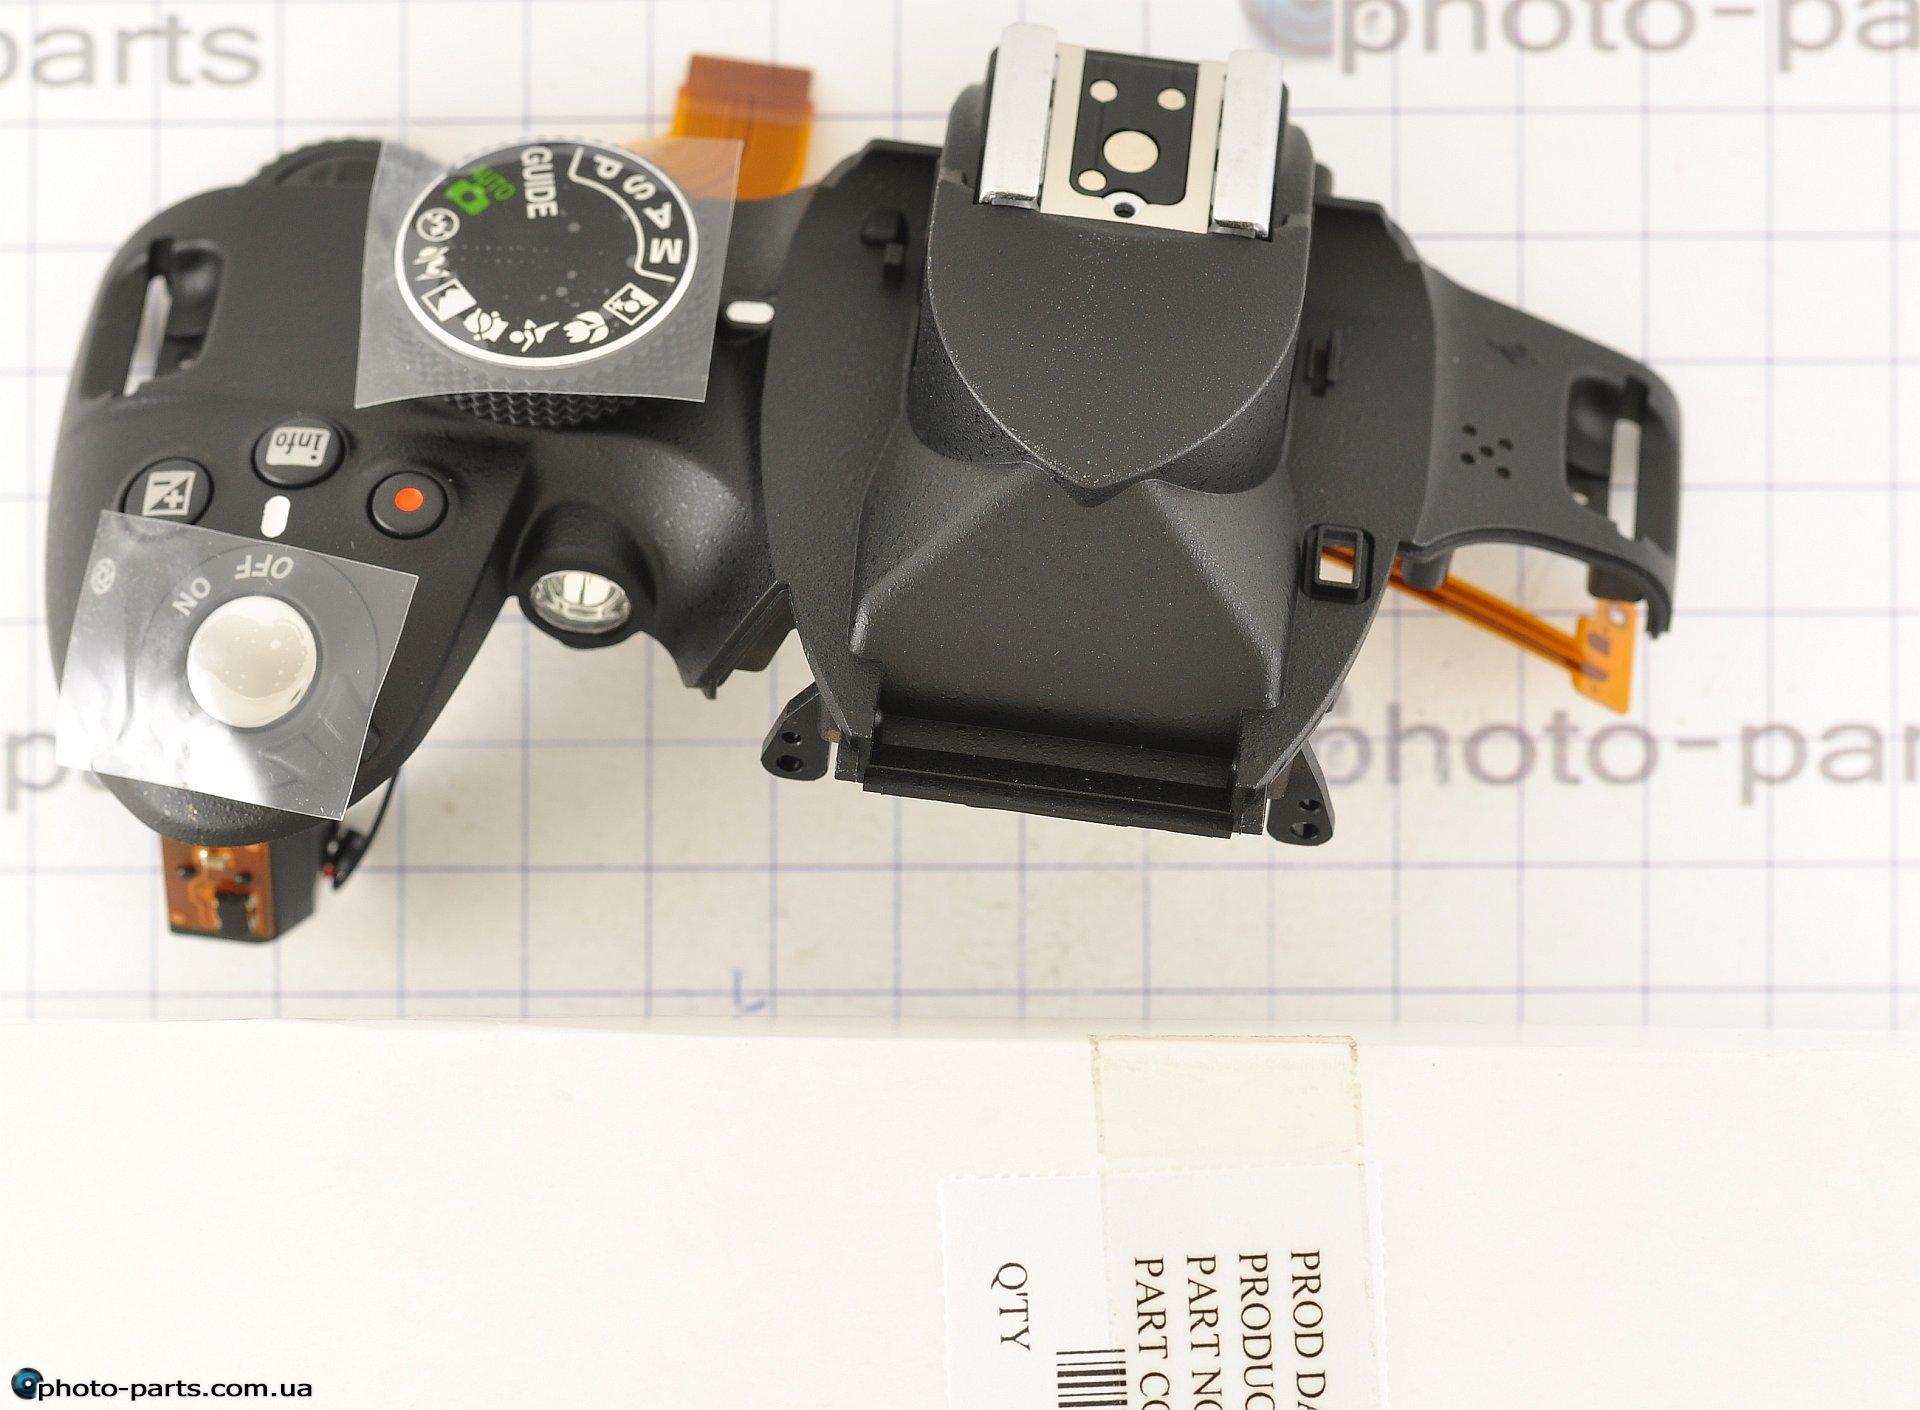 Купить Верхняя панель Nikon D3200, АСЦ 1F999-379 - 520 грн